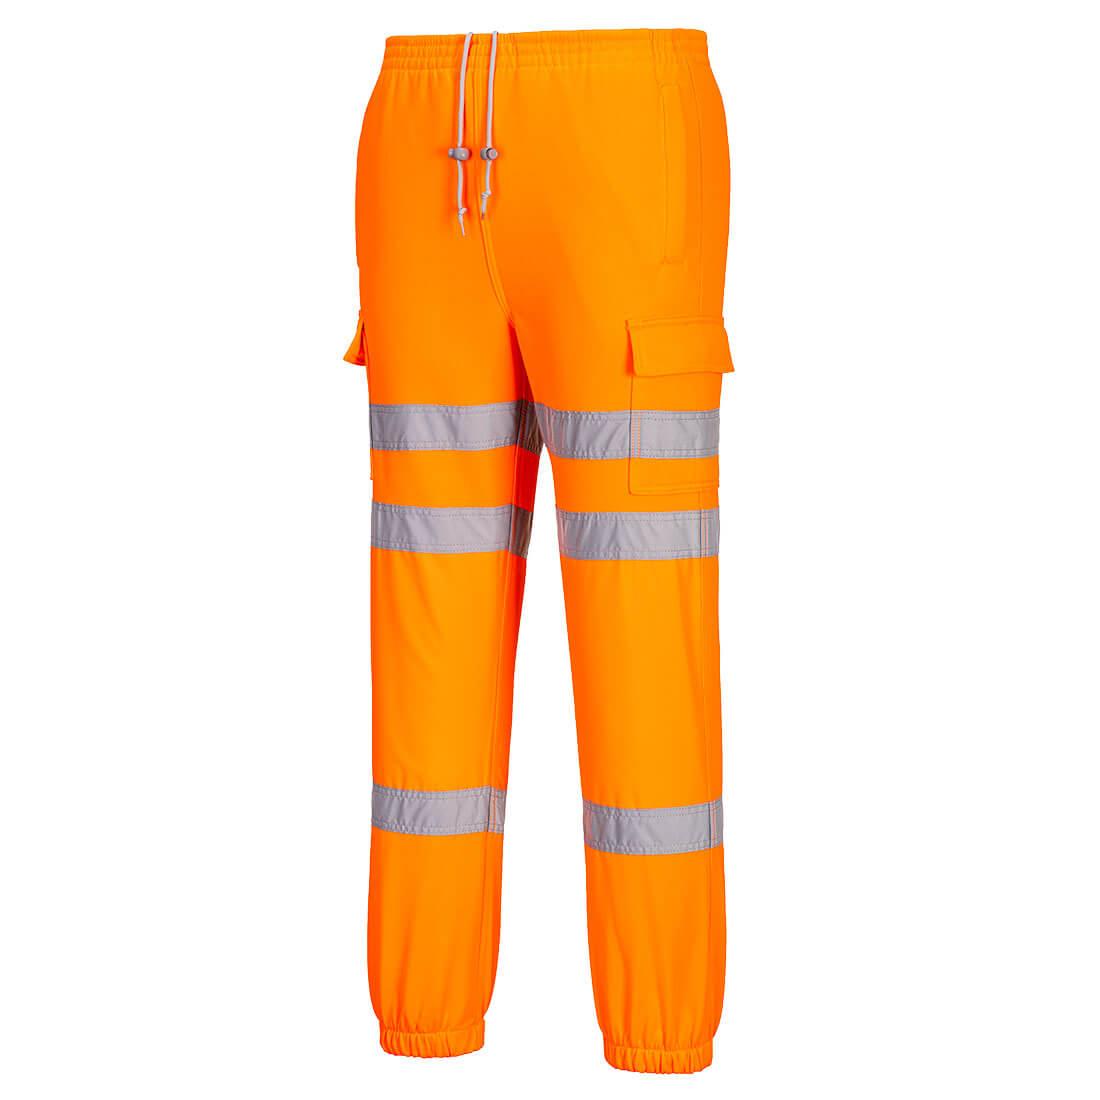 Hi-Vis Jogging Bottoms Orange Small